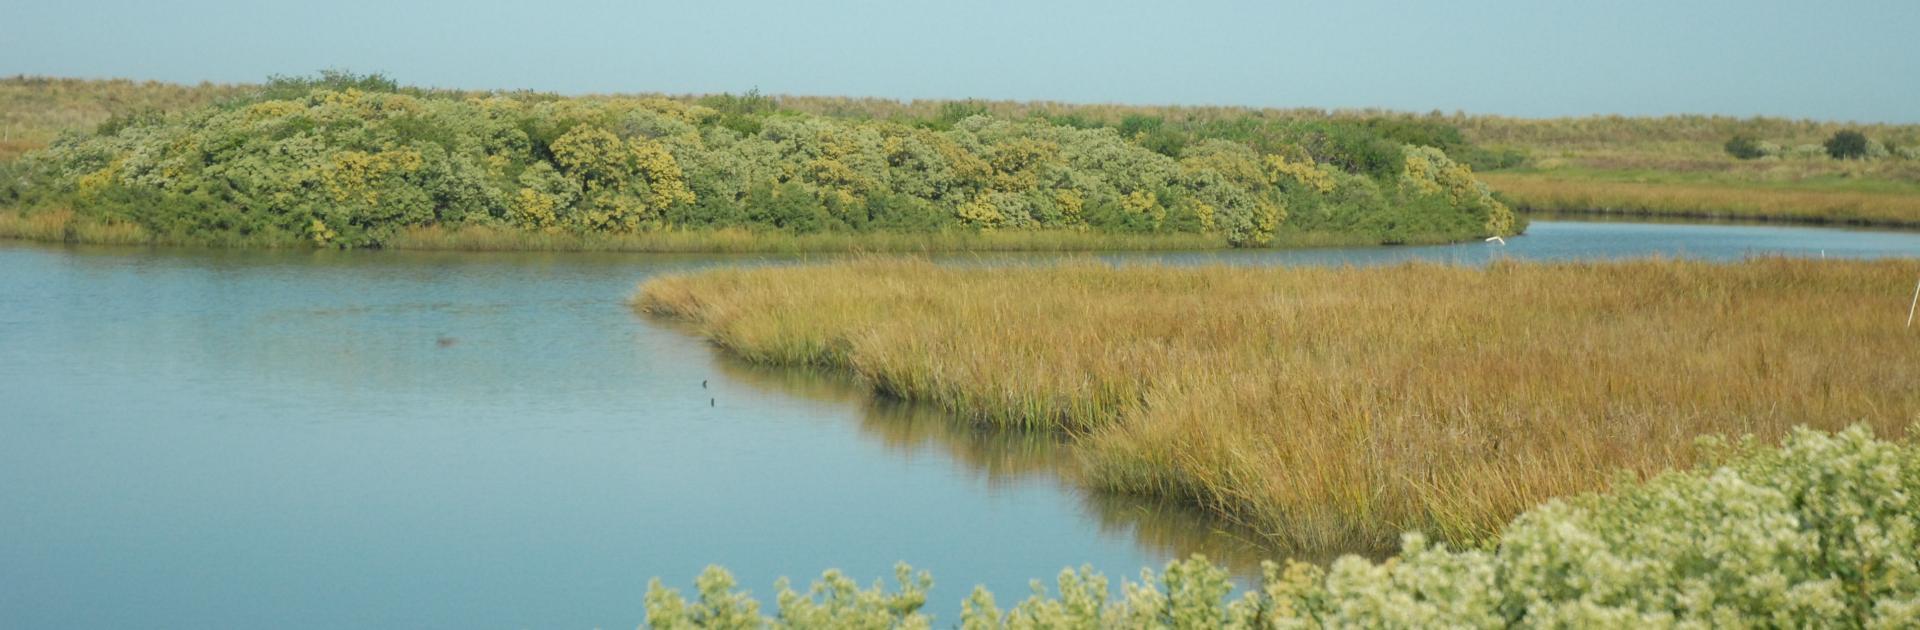 Poplar Island scenery